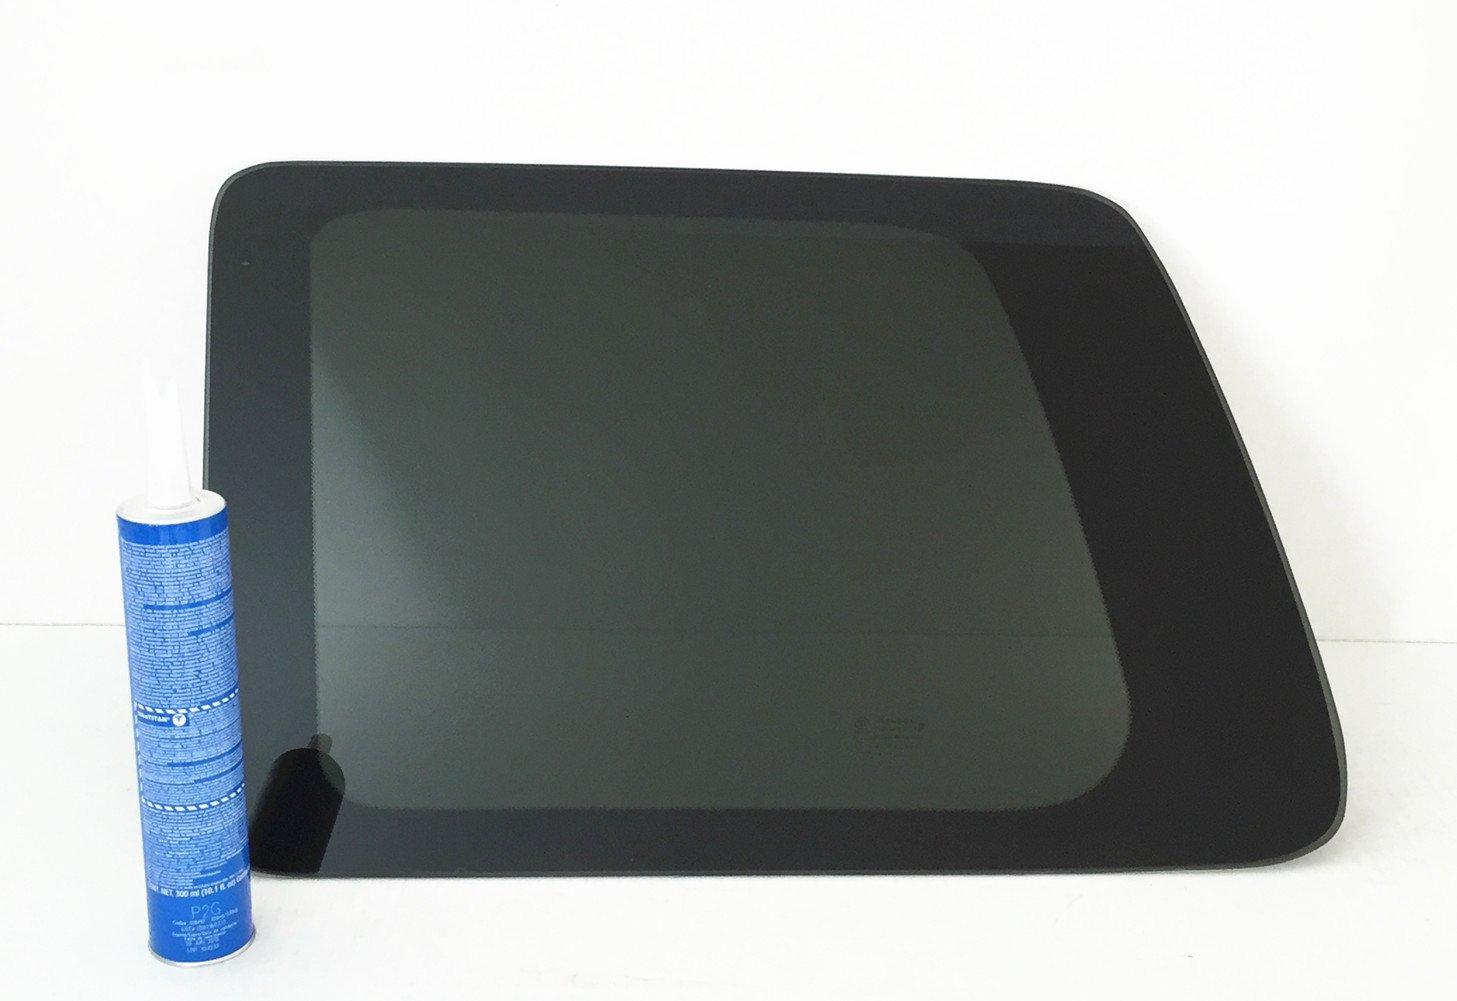 NAGD Compatible with 2009-2015 Honda Pilot Driver Left Side Rear Quarter Glass Quarter Window W//Sika